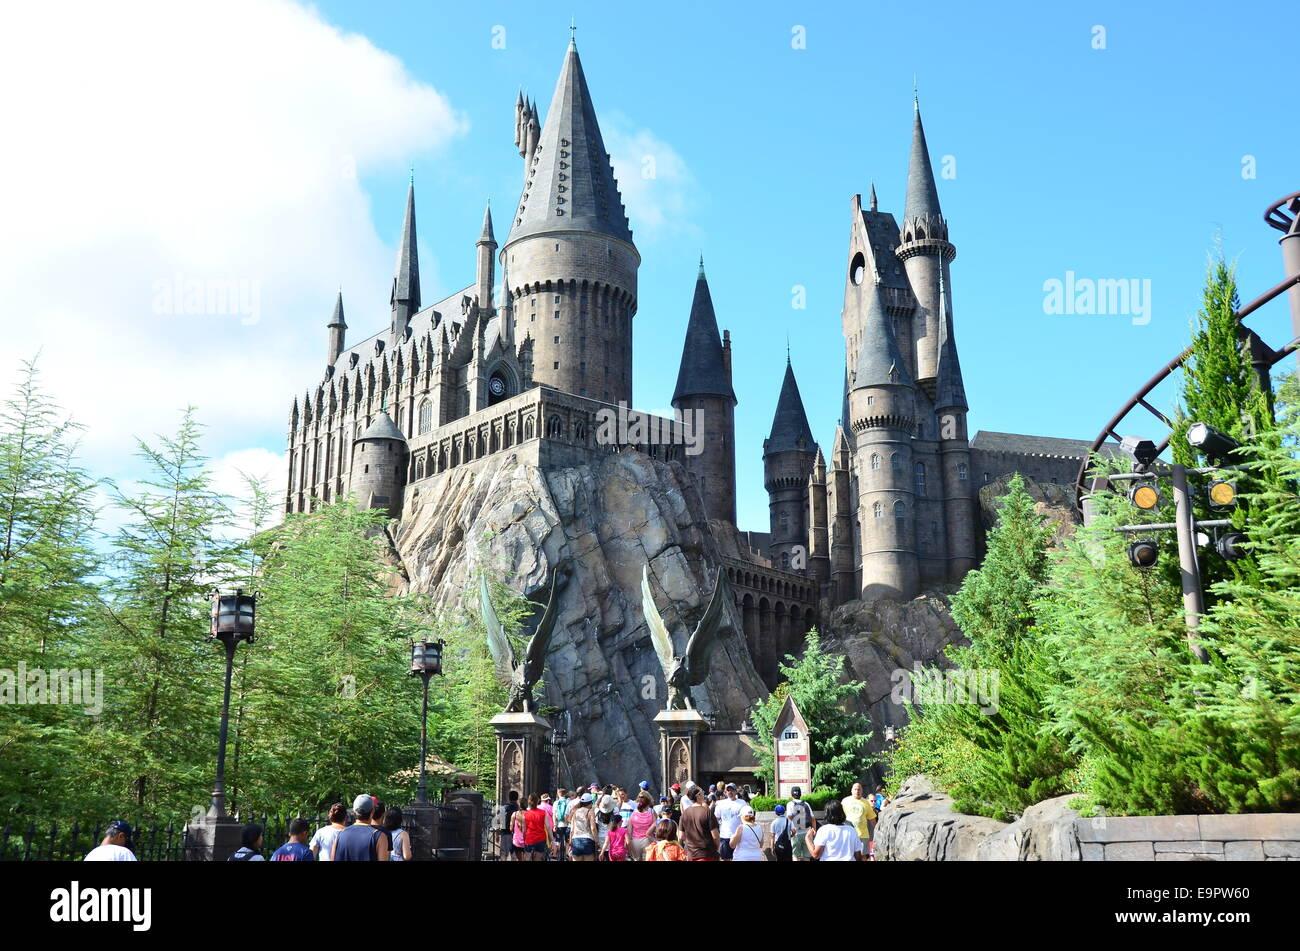 Hogwarts Castle, In The Wizarding World of Harry Potter, Islands of Adventure, Universal Orlando Resort, Orlando, - Stock Image